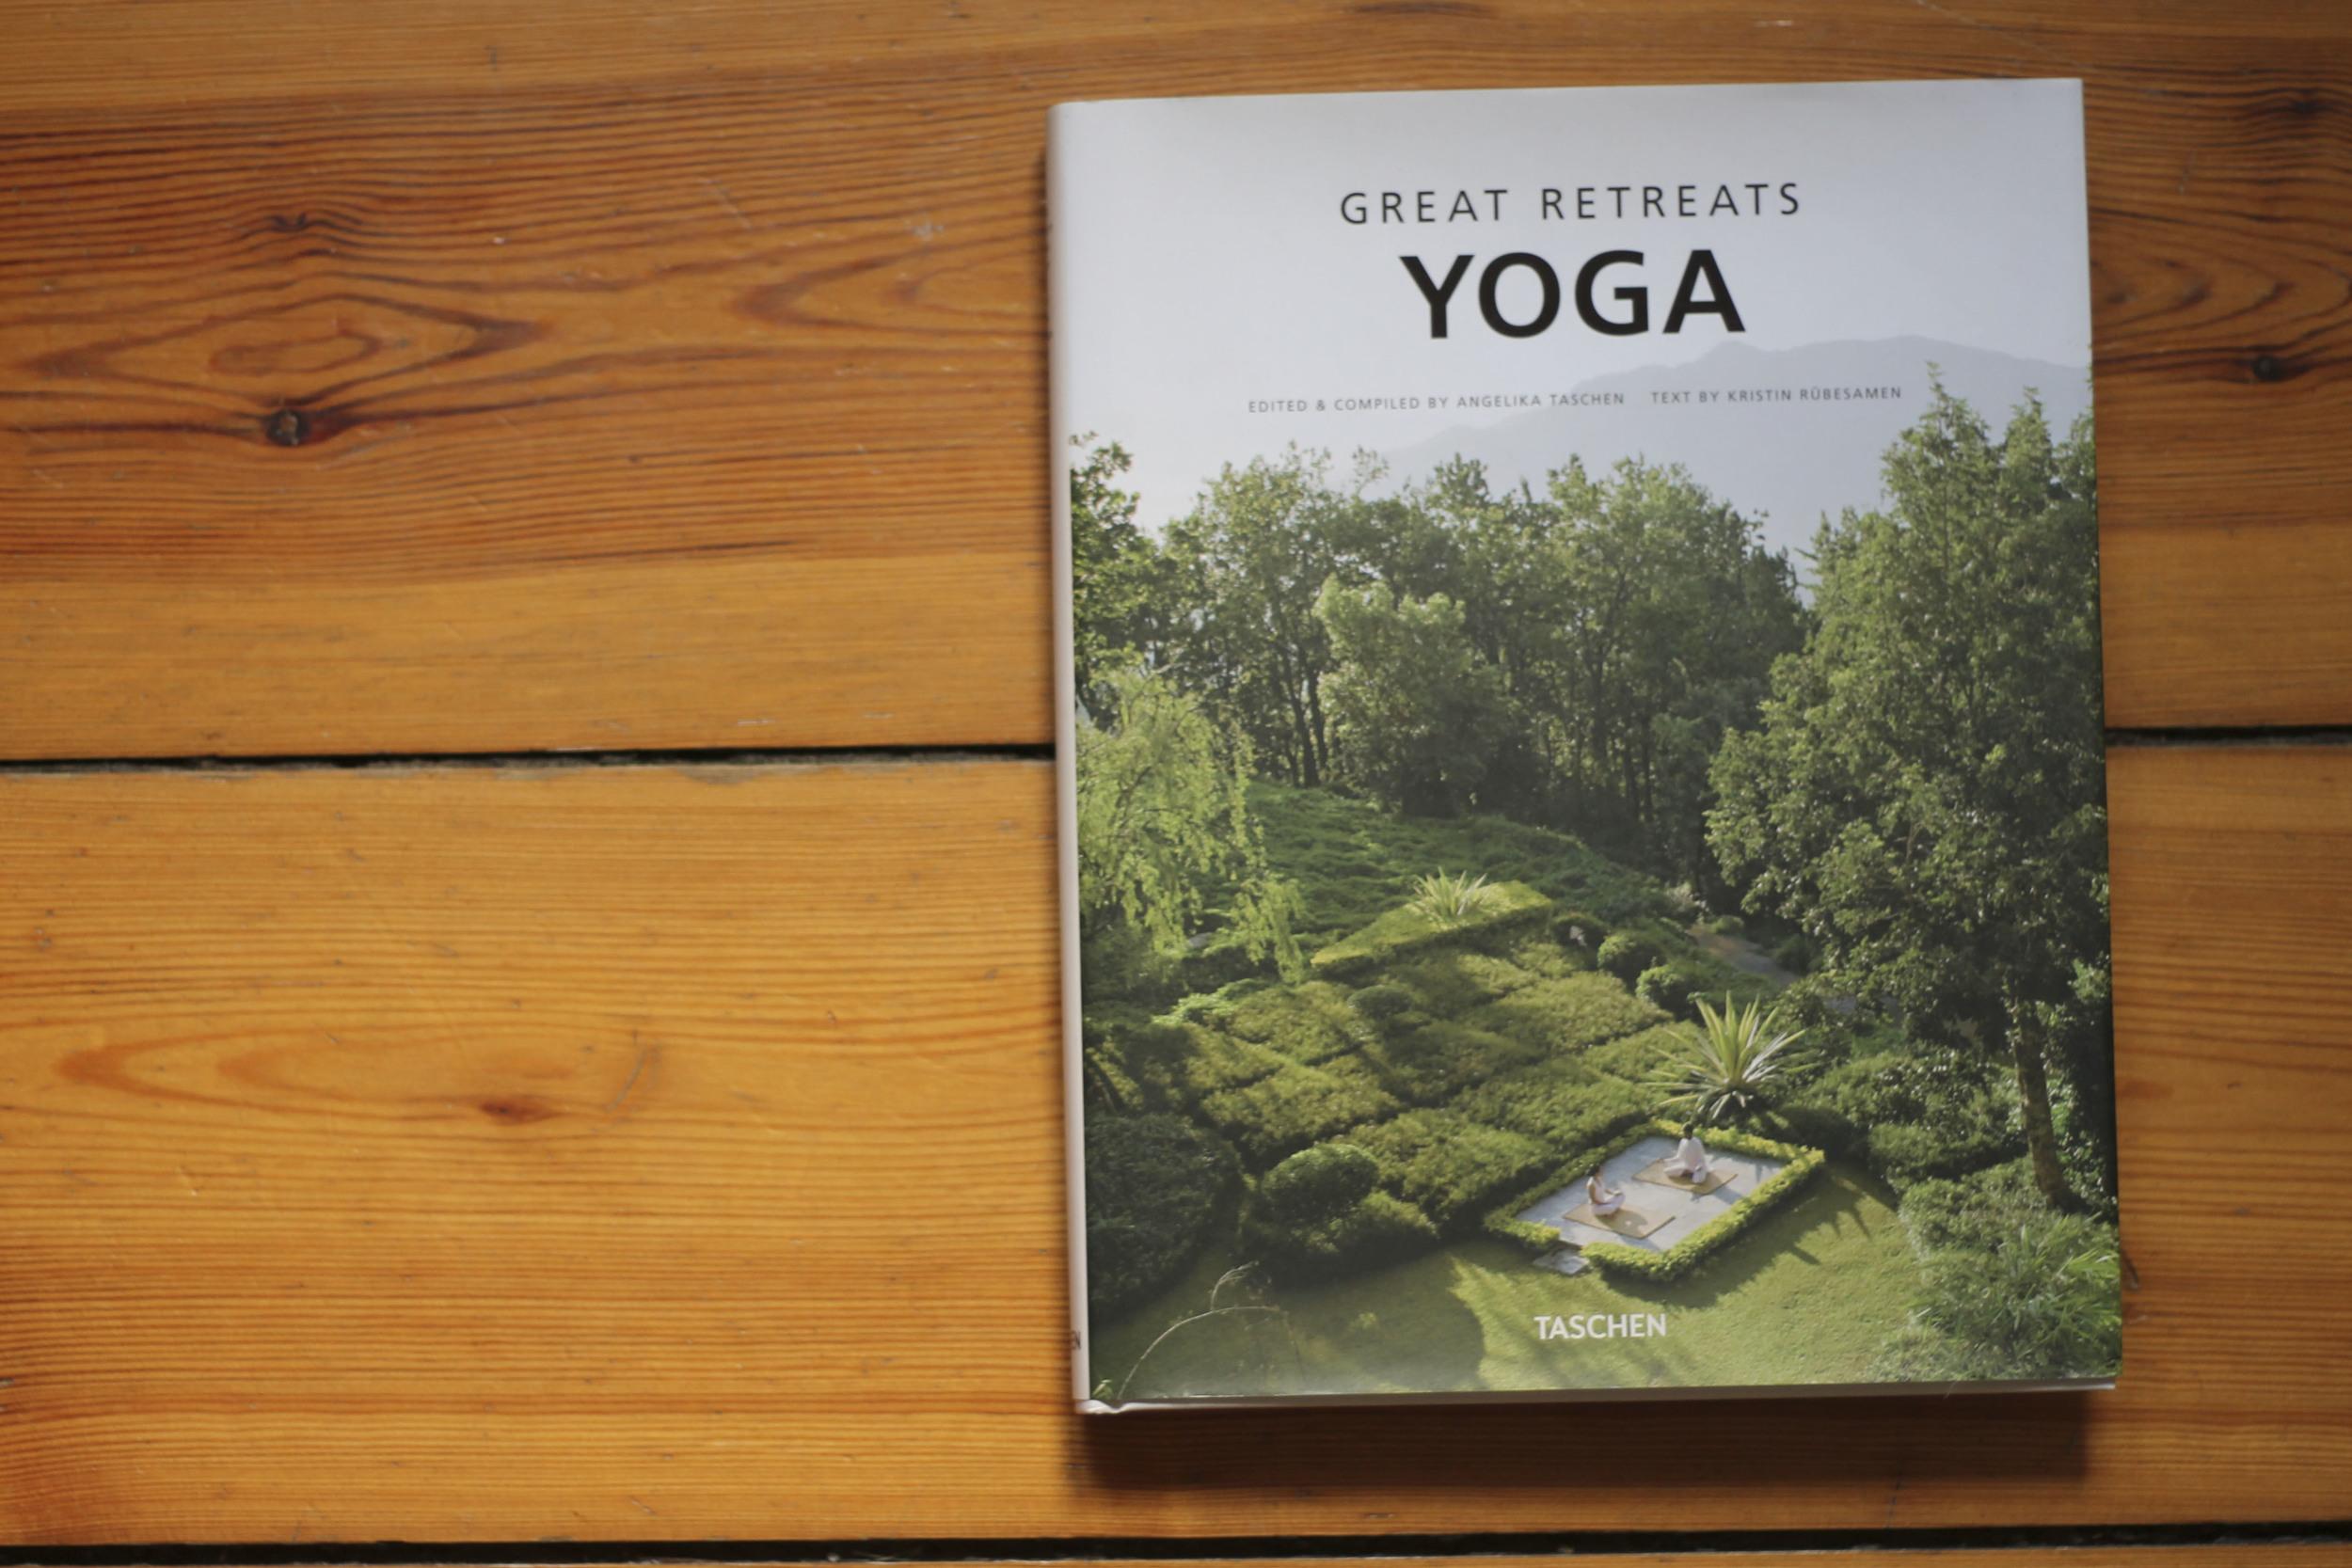 Taschen great retreats yoga677.jpg